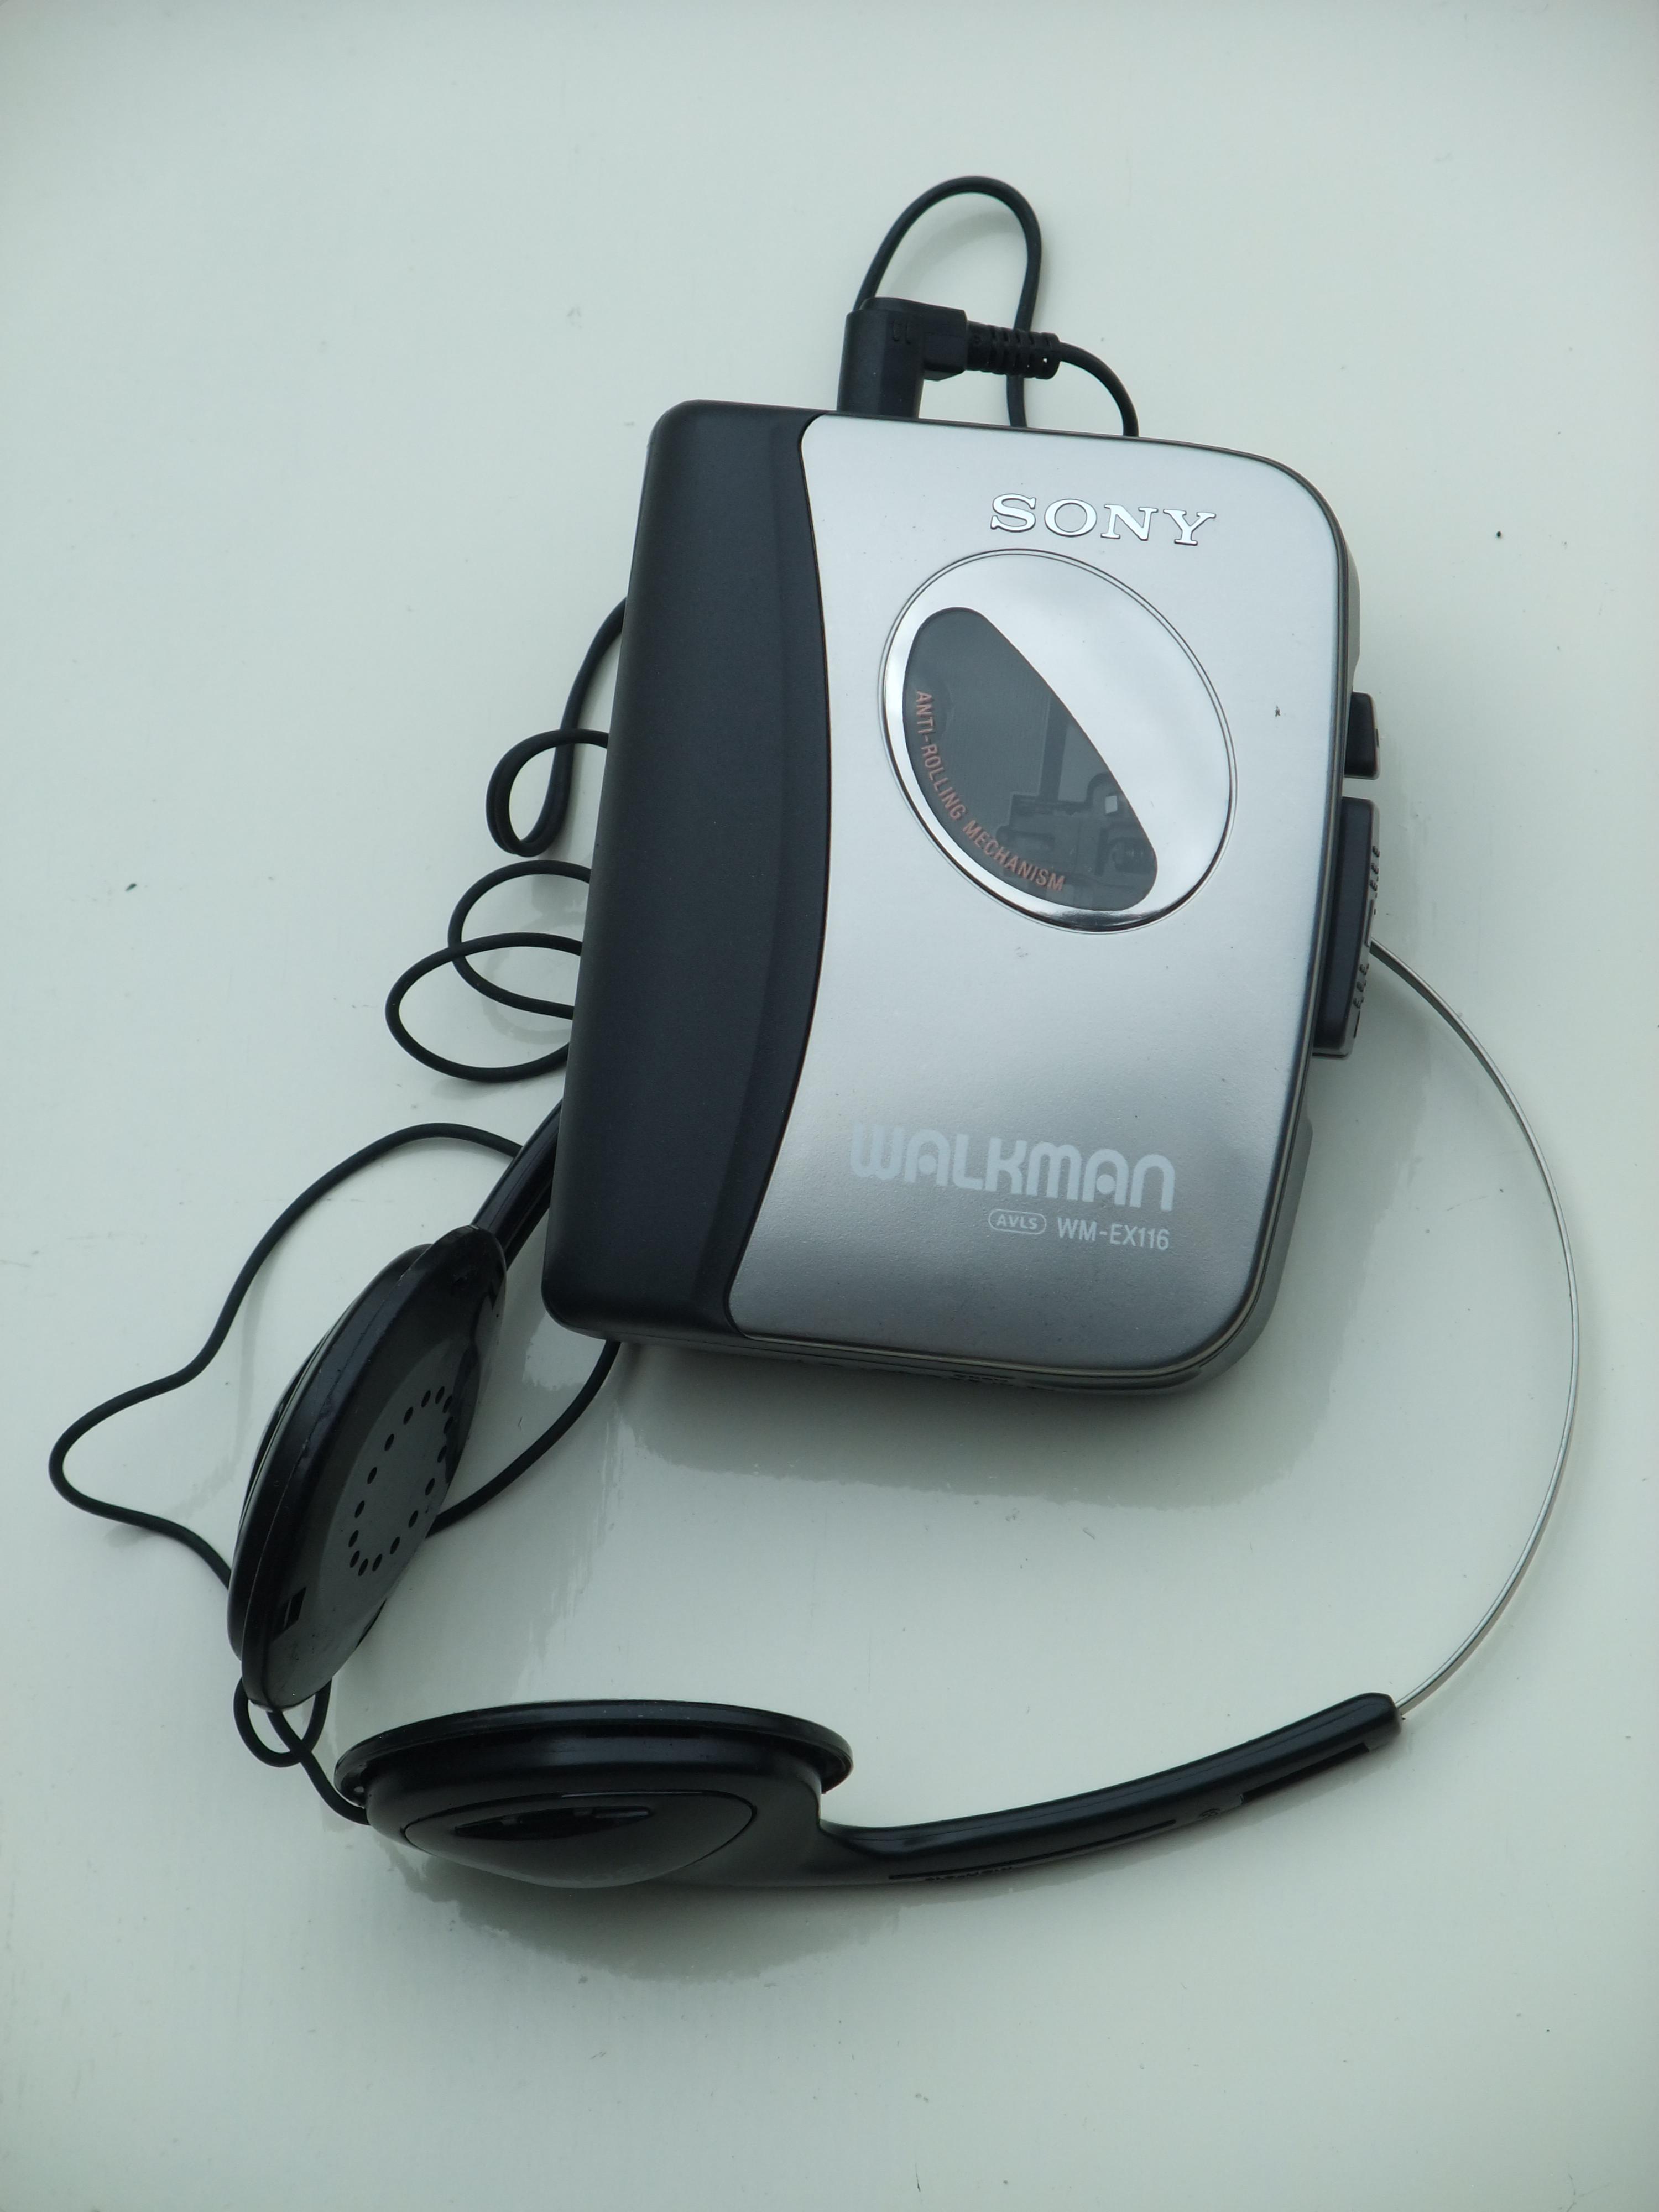 File Sony Walkman Wm Ex116 Cassette Player Jpg Wikimedia Commons